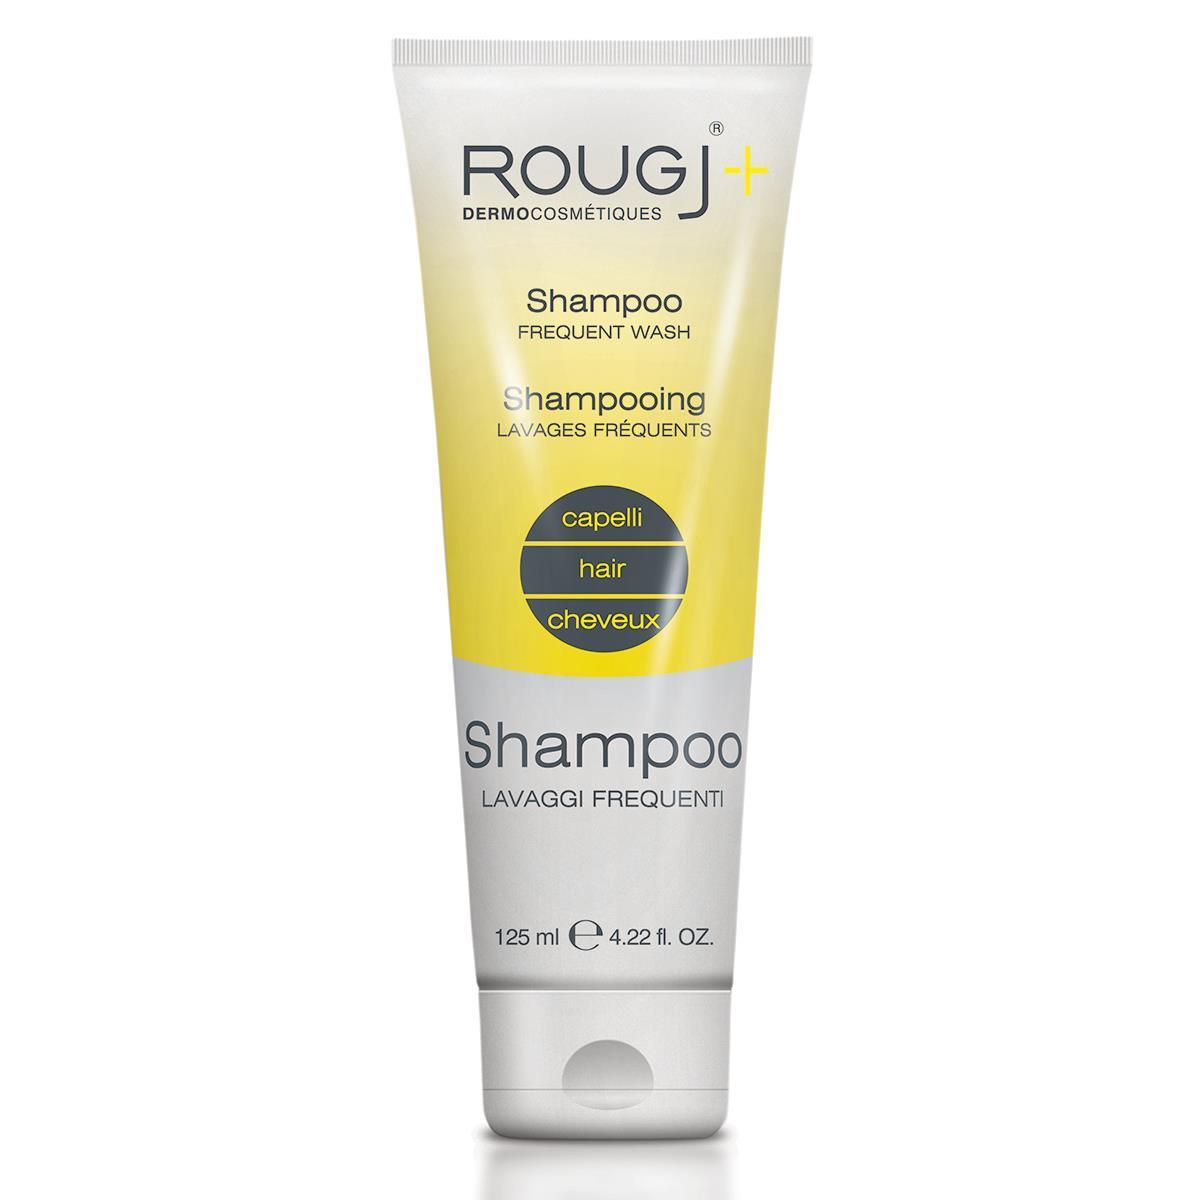 Shampoo Lavado Frecuente 125Ml